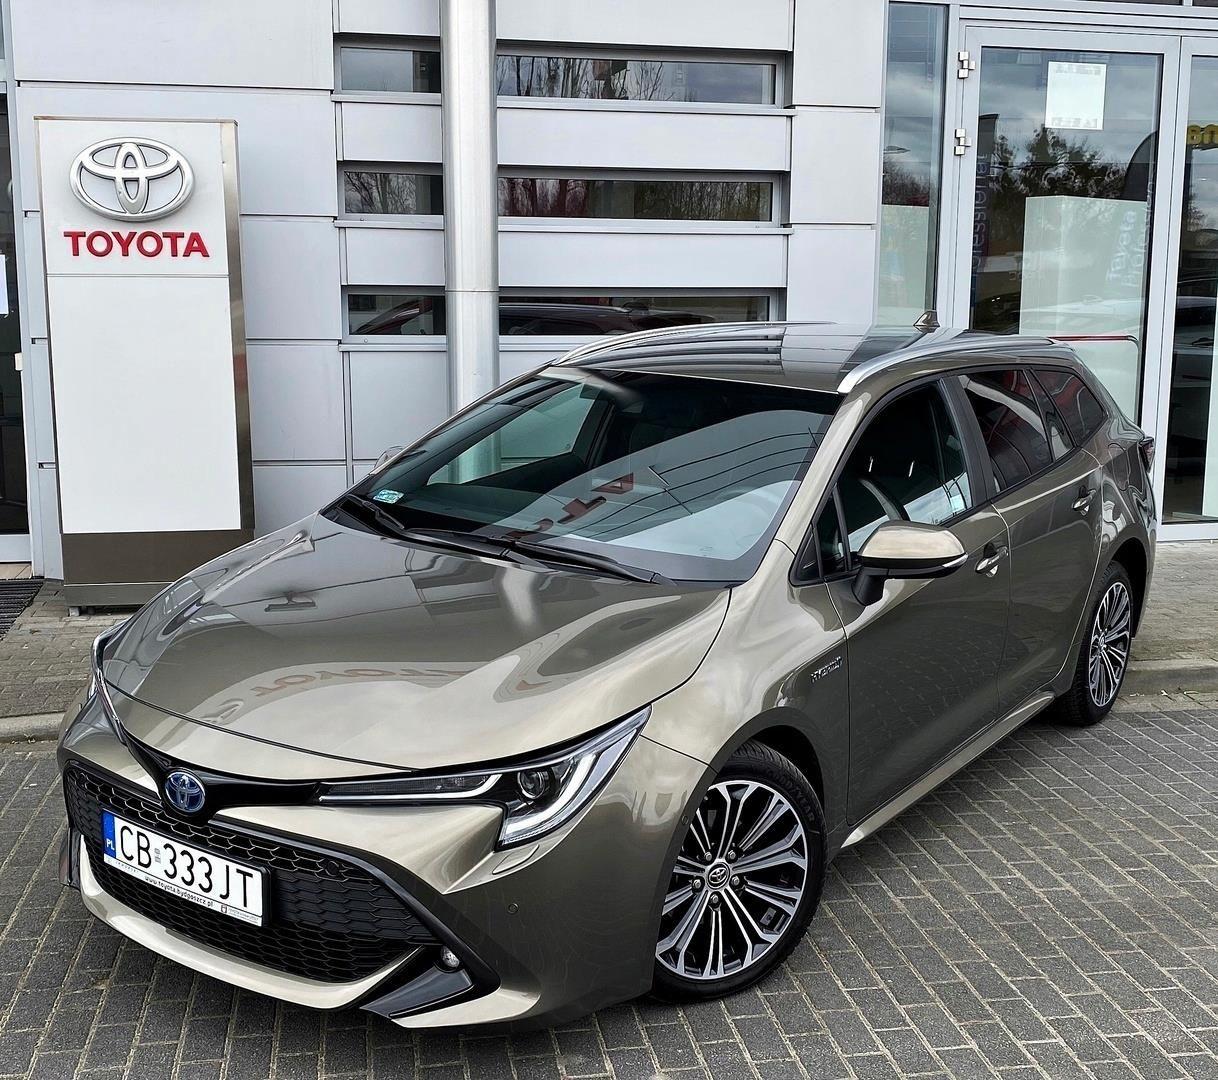 Toyota Corolla 1 8 Hybrid Comfort Navi Style Opinie I Ceny Na Ceneo Pl